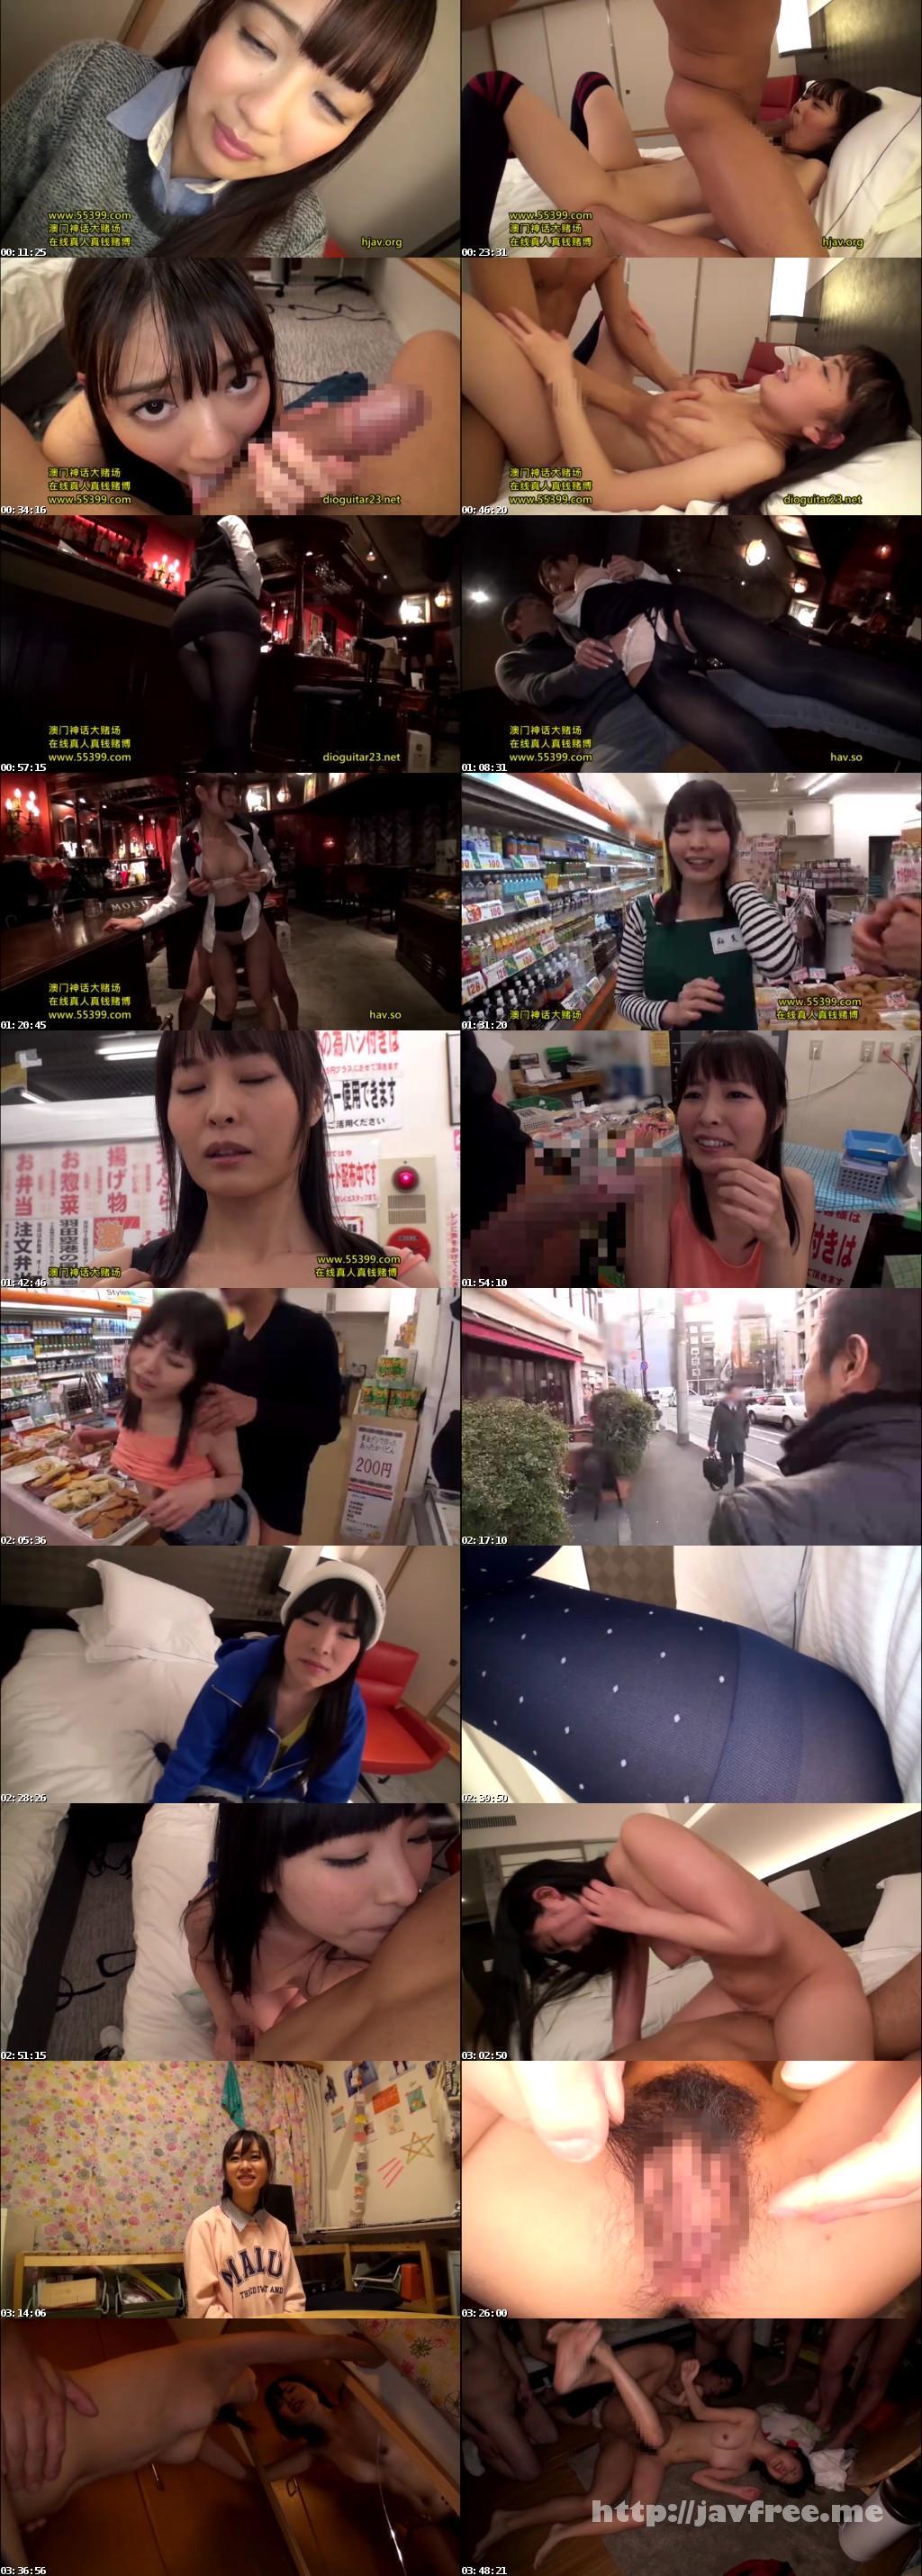 [YRH 042] 完全ガチ交渉!噂の、素人激カワ看板娘を狙え!vol.11 YRH